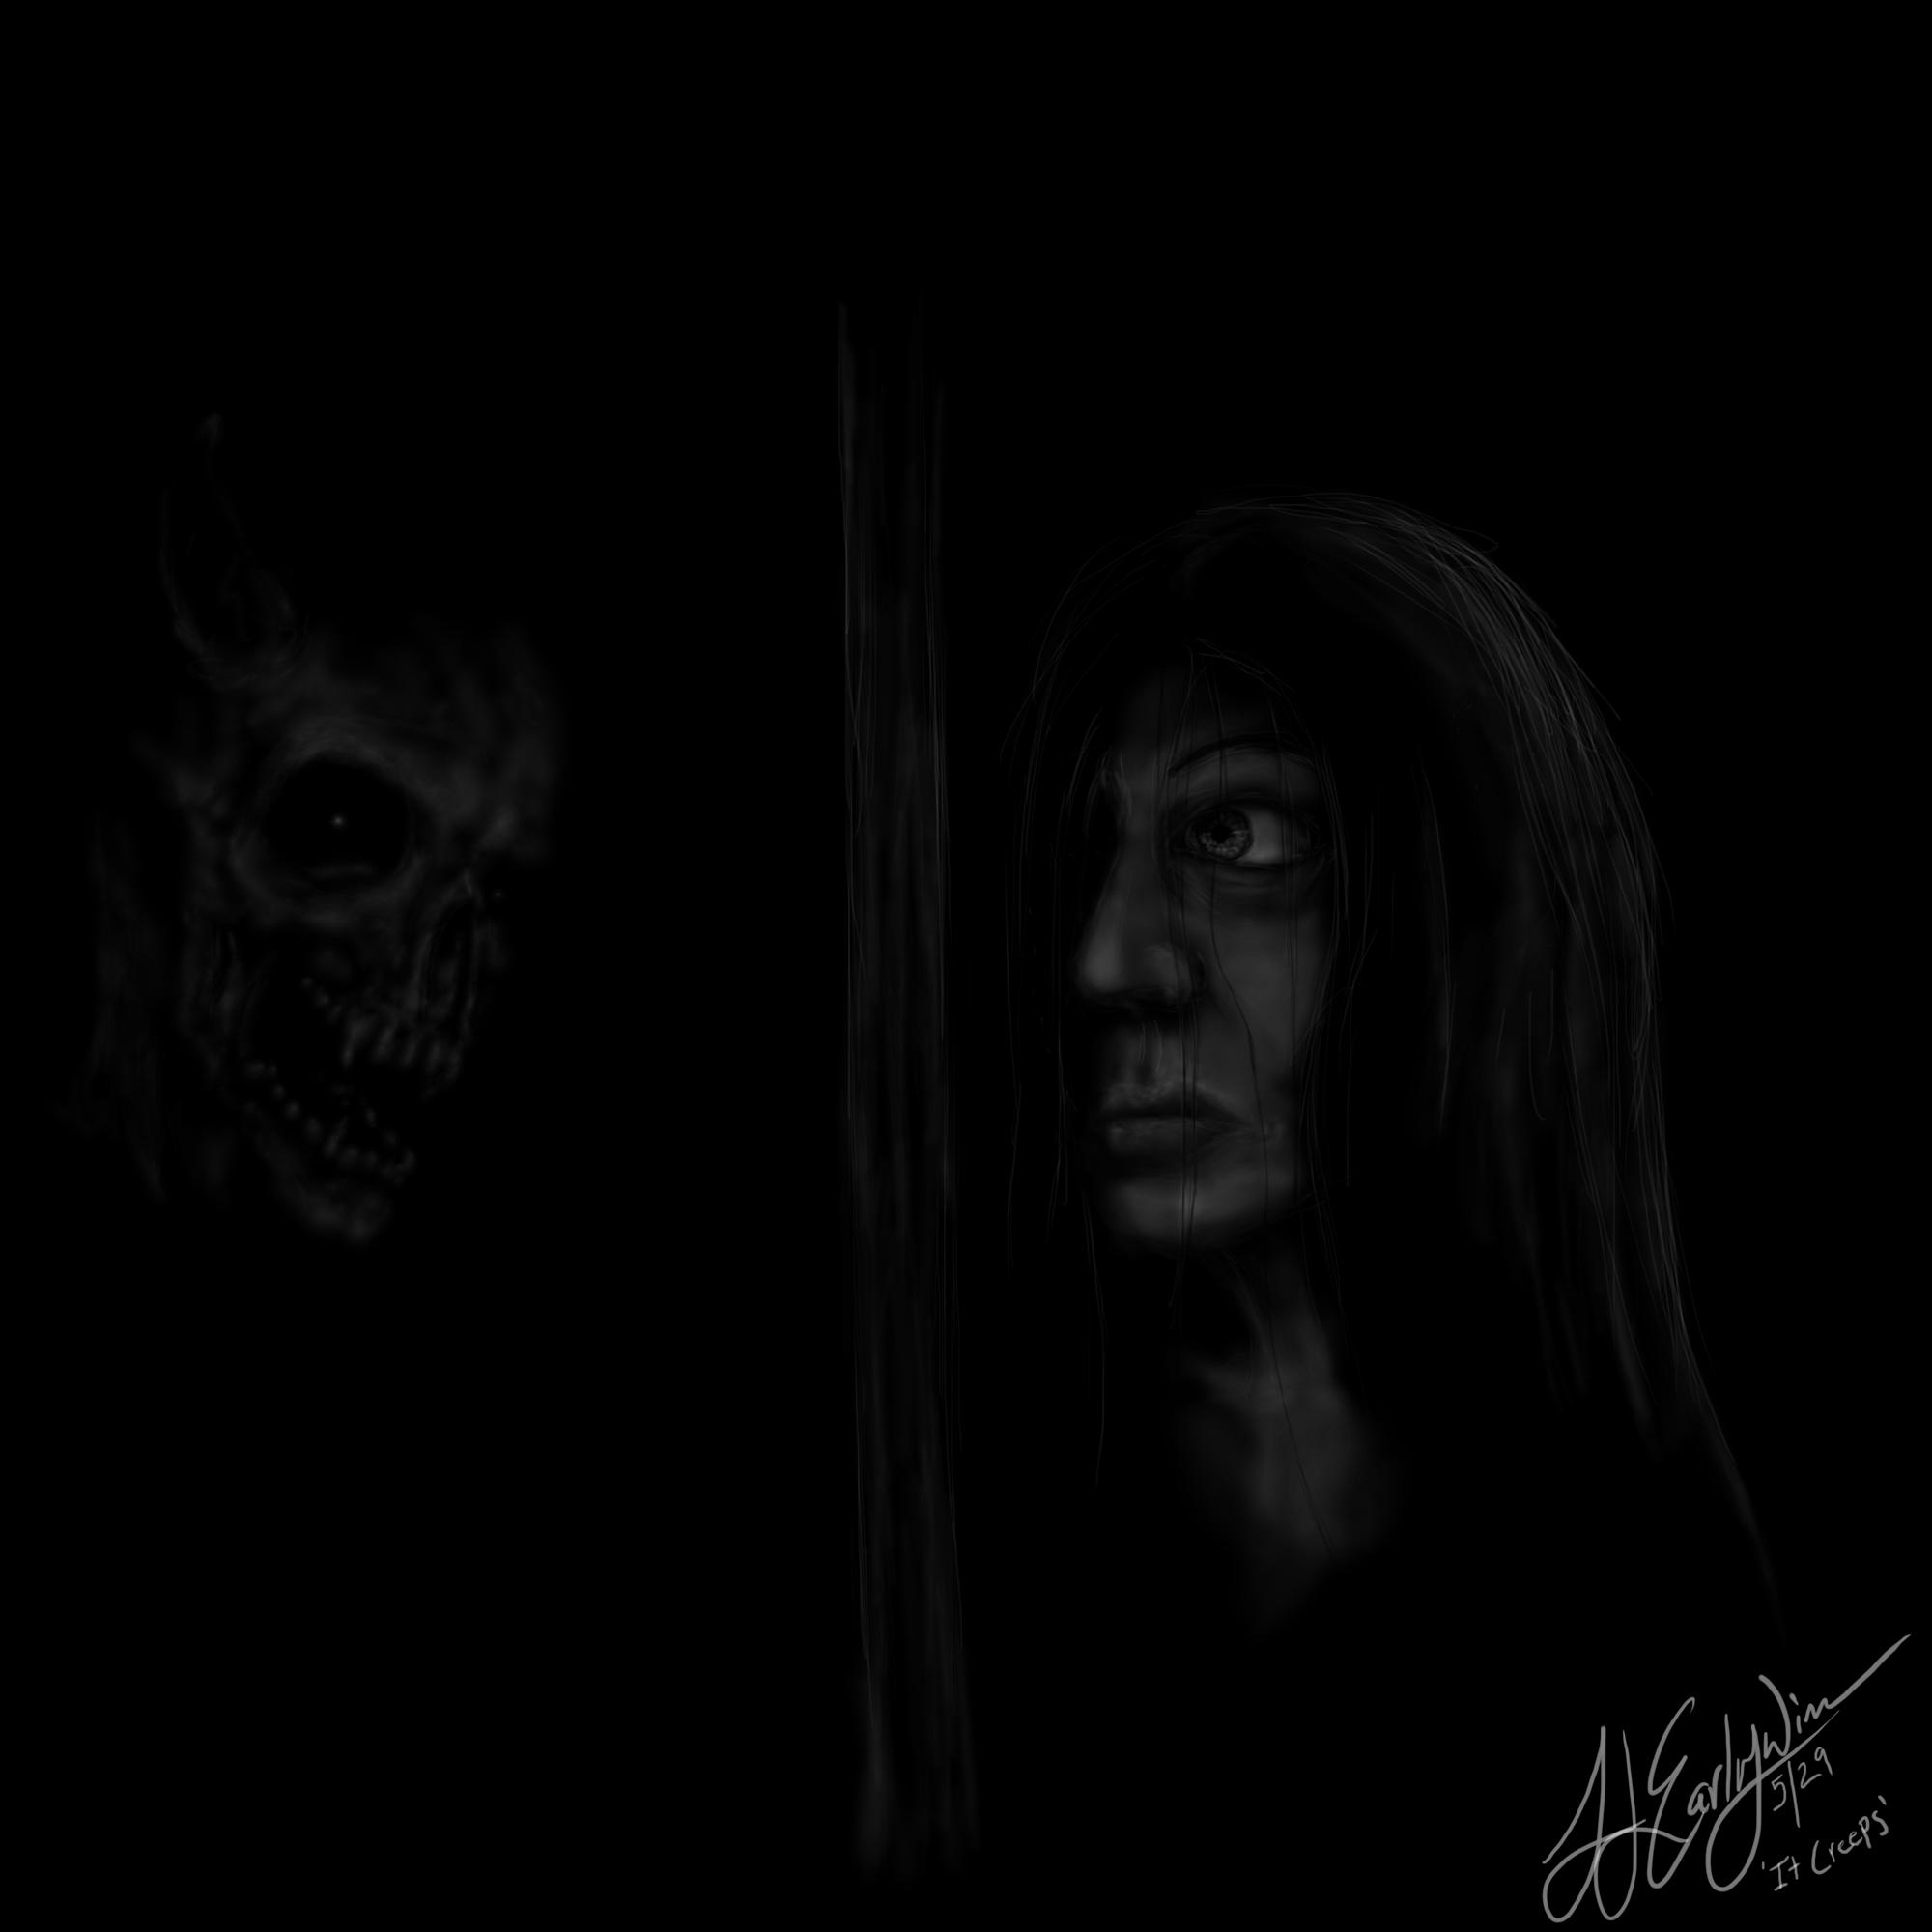 In the Dark - 'It Creeps'